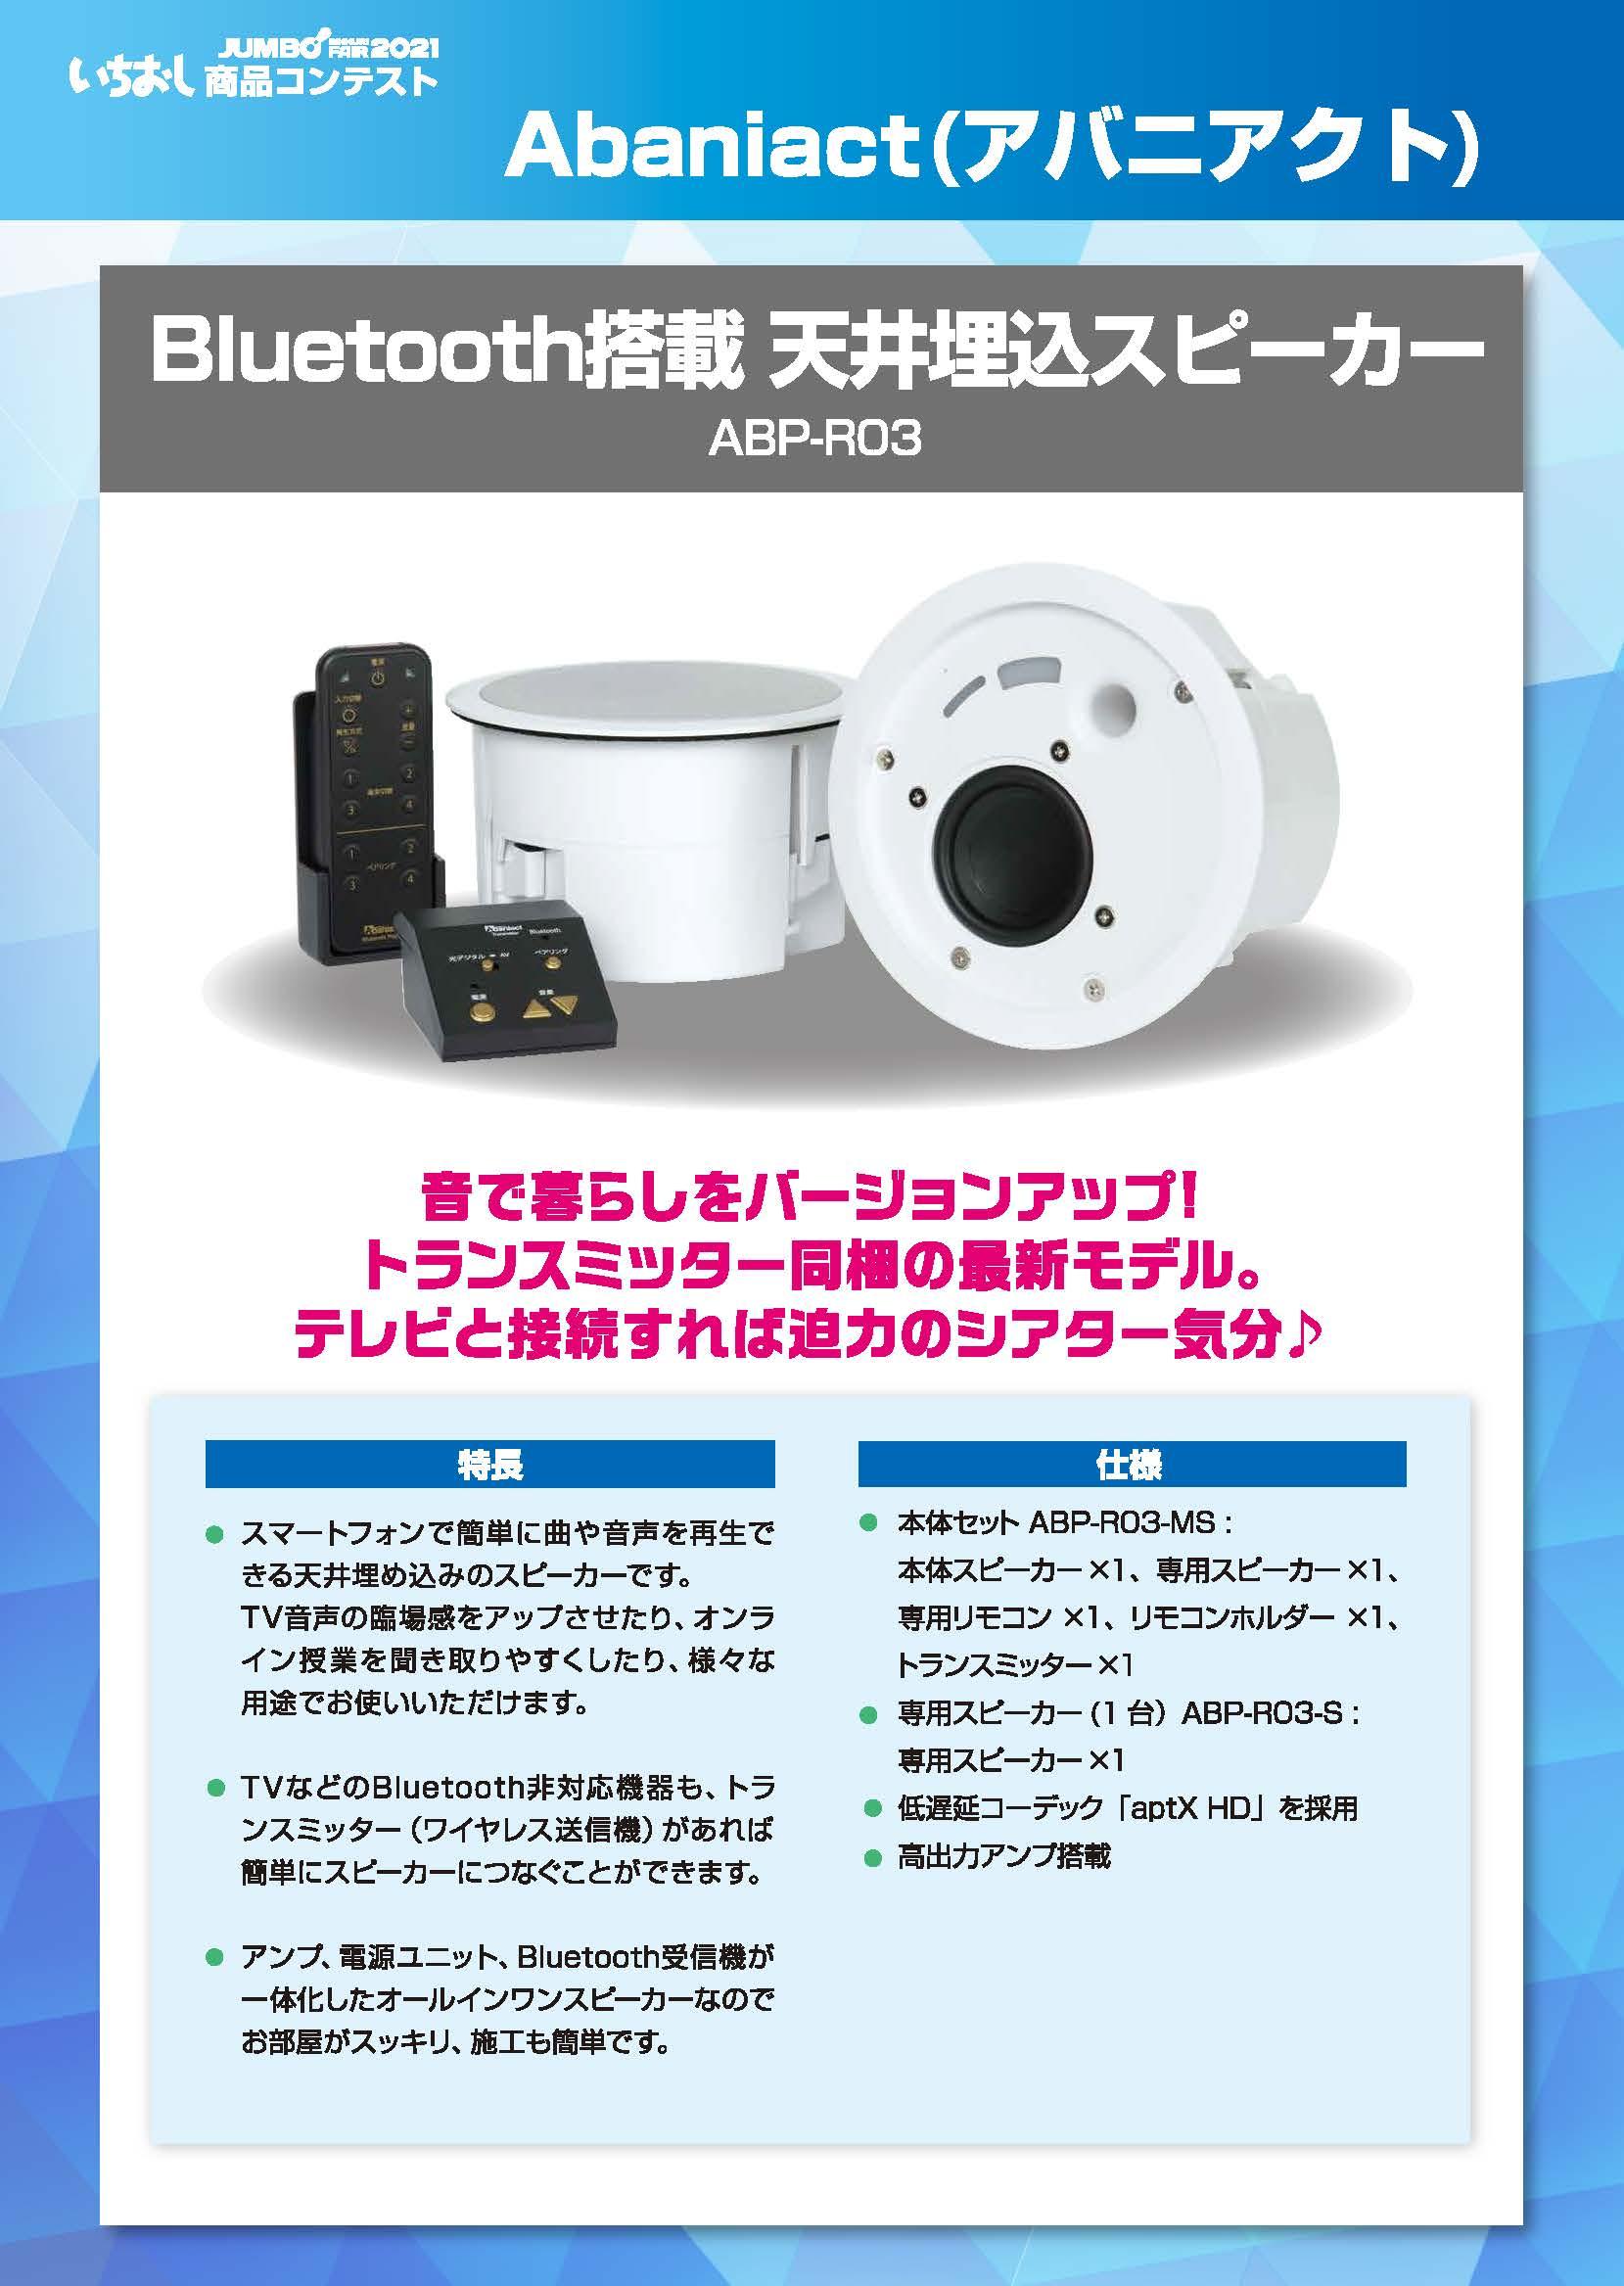 「Bluetooth搭載天井埋込スピーカー」Abaniact(アバニアクト)の画像